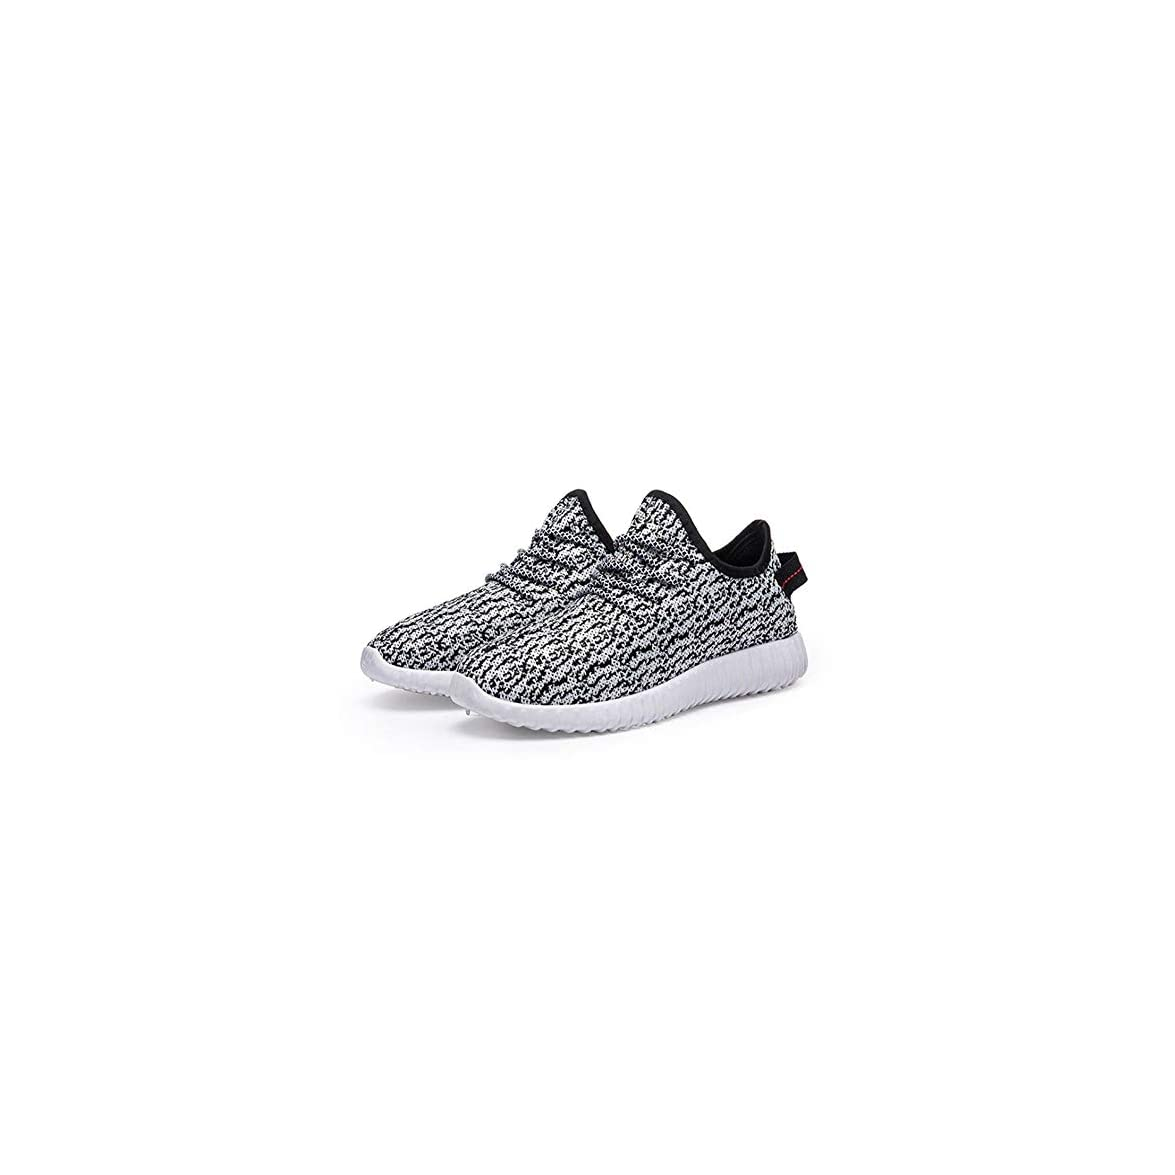 Ysfu Sneaker Sneakers Da Donna Scarpe Sportive Casual Cesto Leggero Corsa Outdoor